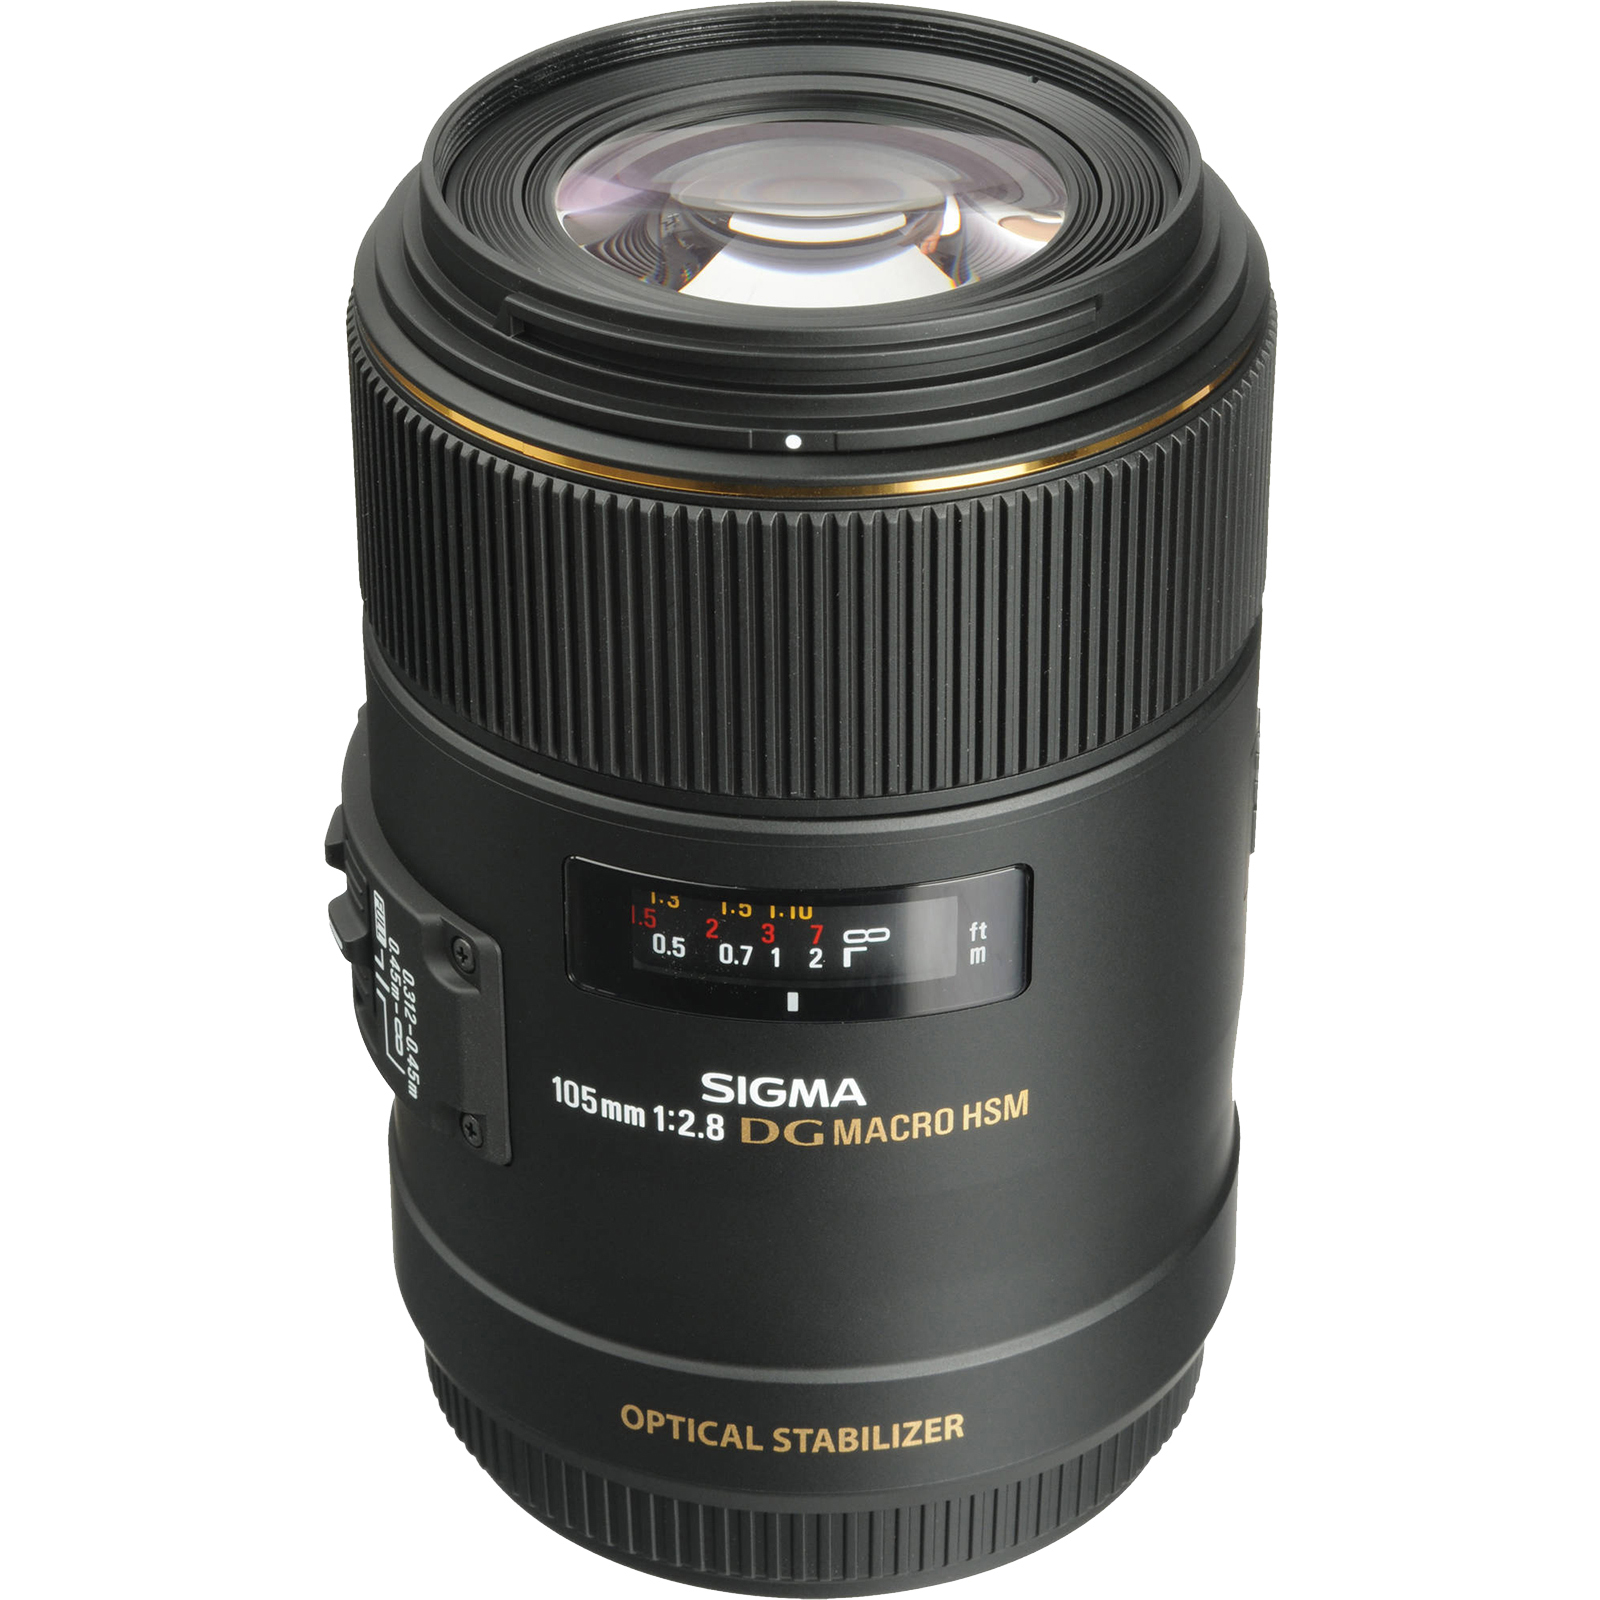 Sigma 105mm f/2.8 EX DG OS HSM Macro Lens (for Canon EOS Cameras)